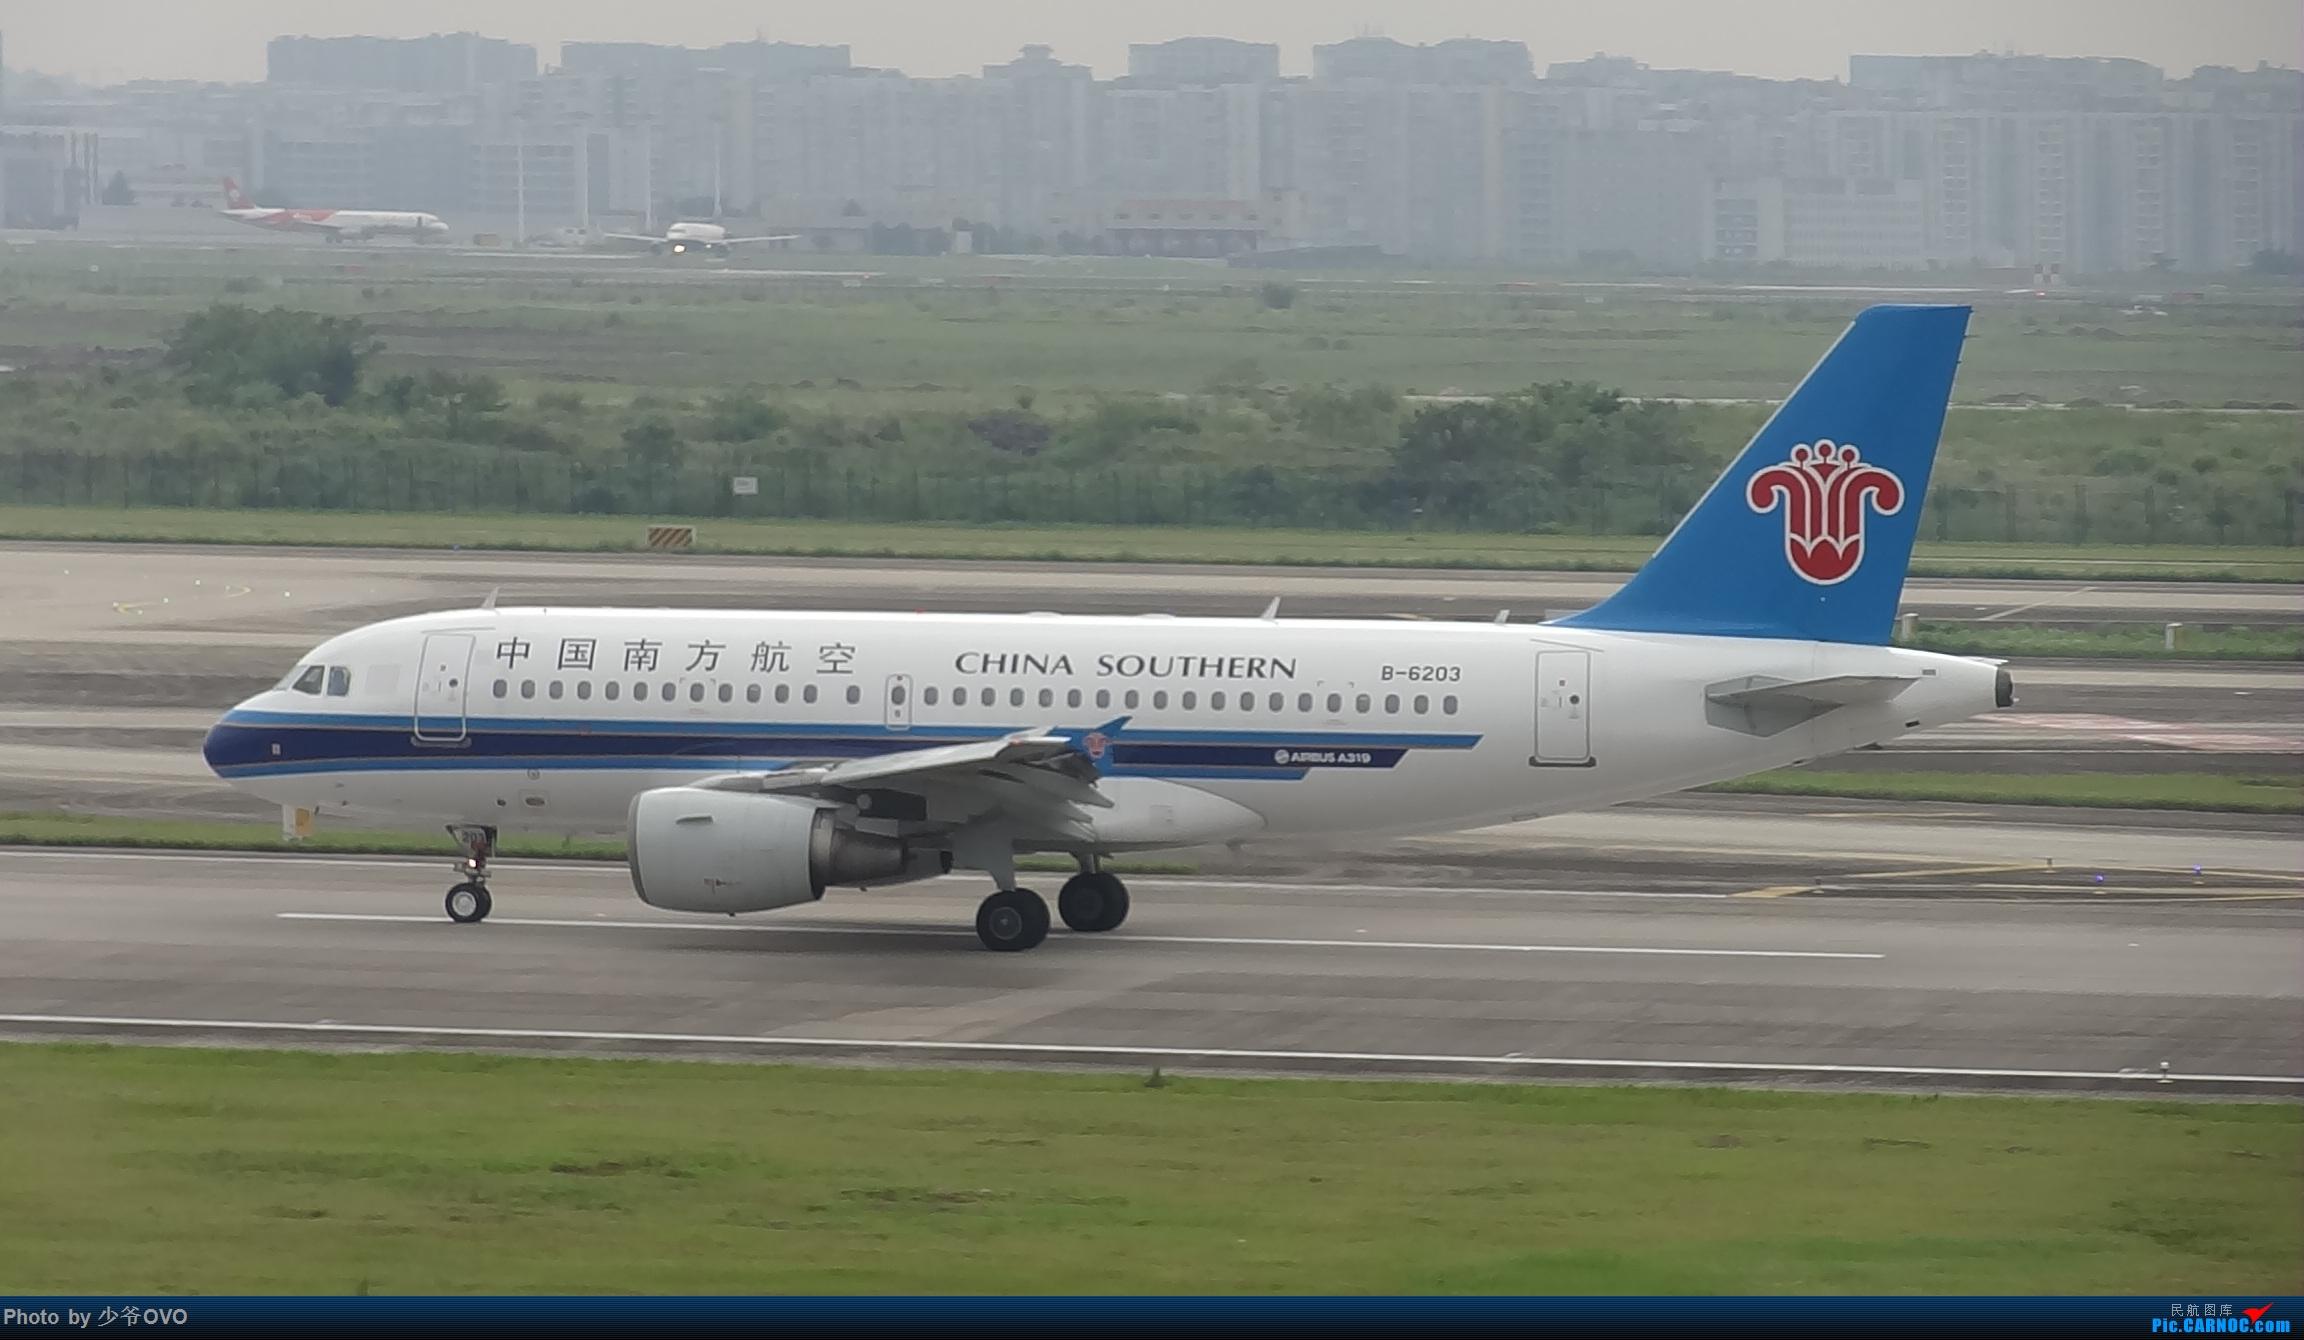 Re:[原创]CKG重庆江北机场拍机 ,中法建交50周年 AIRBUS A319-100 B-6203 中国重庆江北国际机场